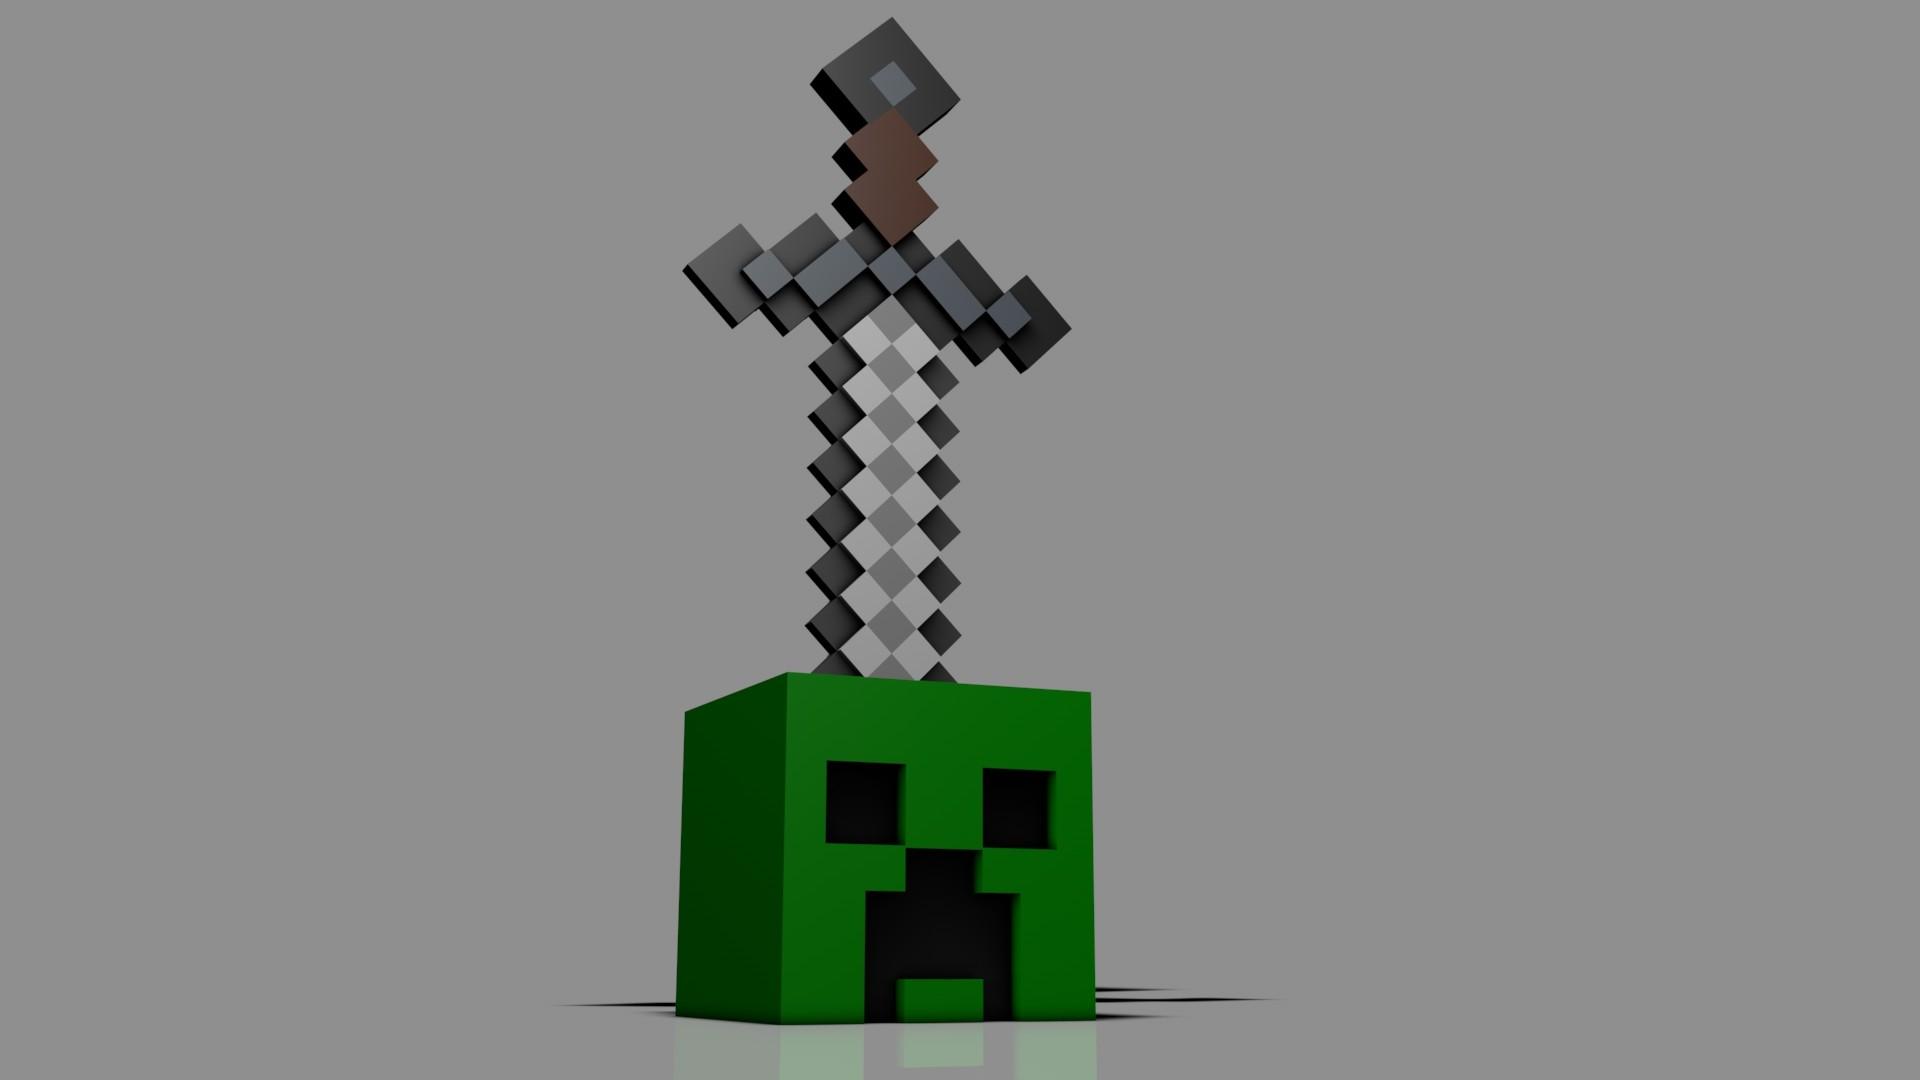 Minecraft Creeper 596 1920x1080 Px HDWallSource